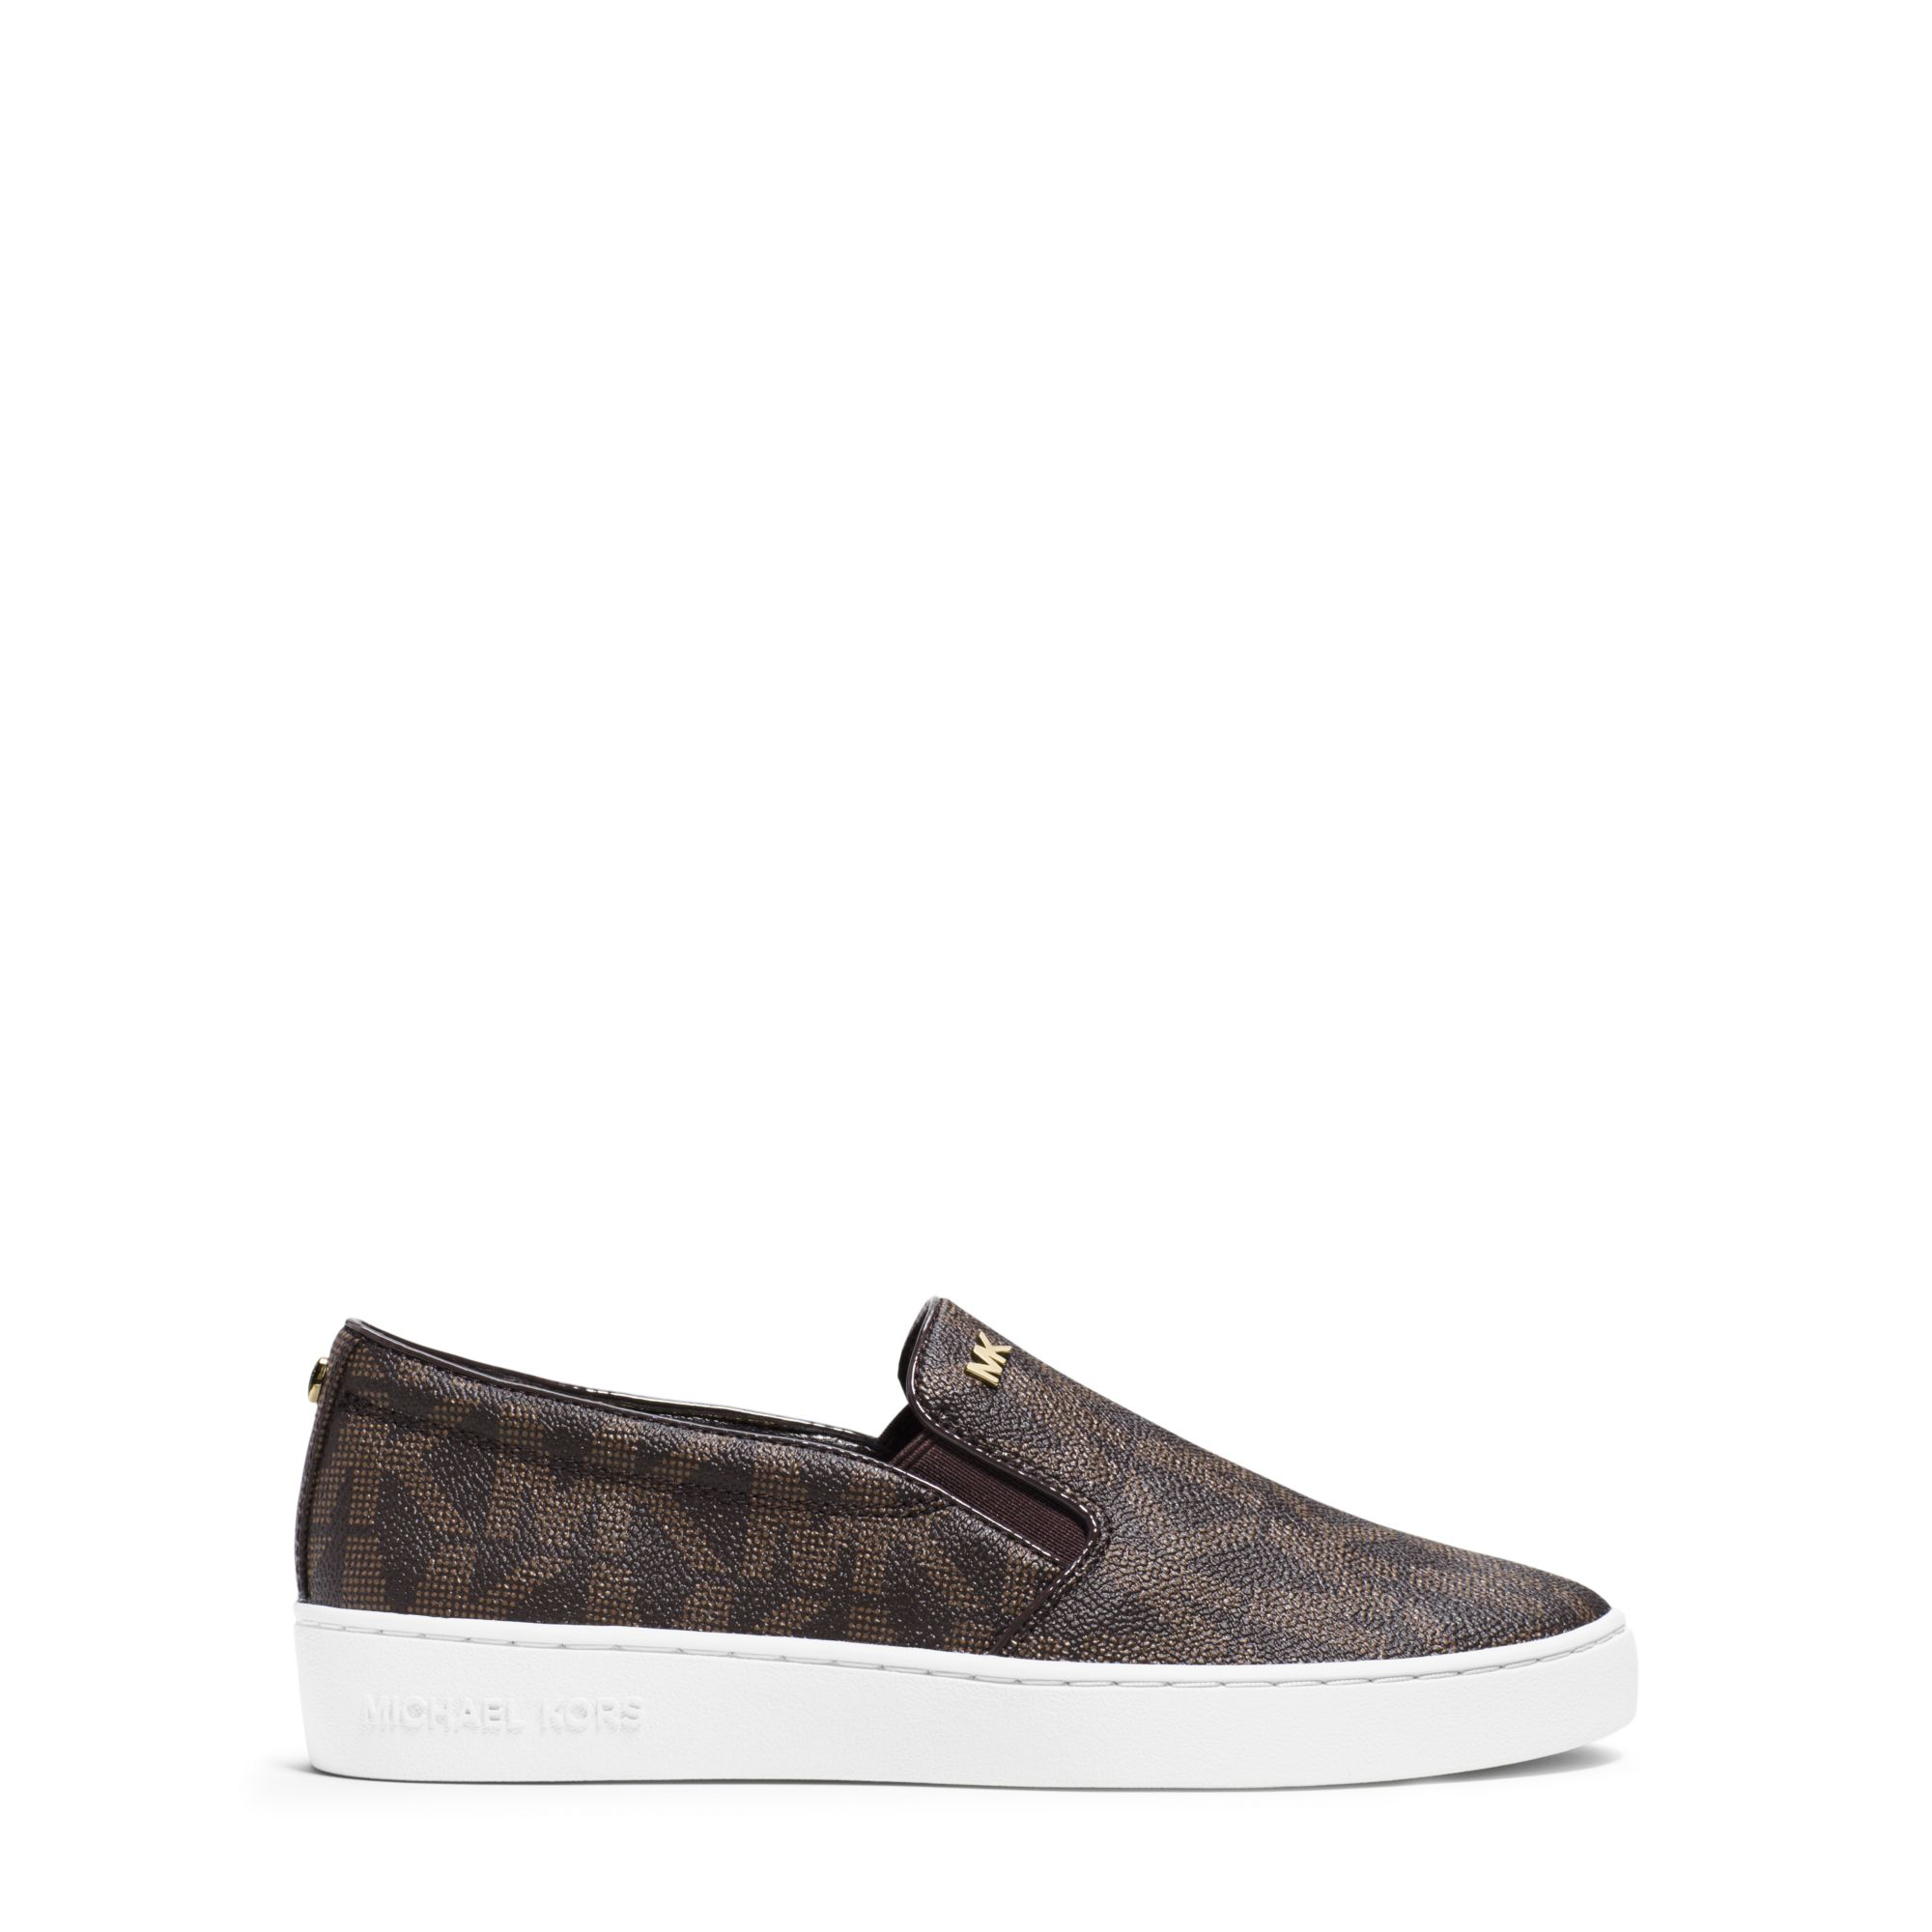 michael kors keaton logo slip on sneaker in brown. Black Bedroom Furniture Sets. Home Design Ideas